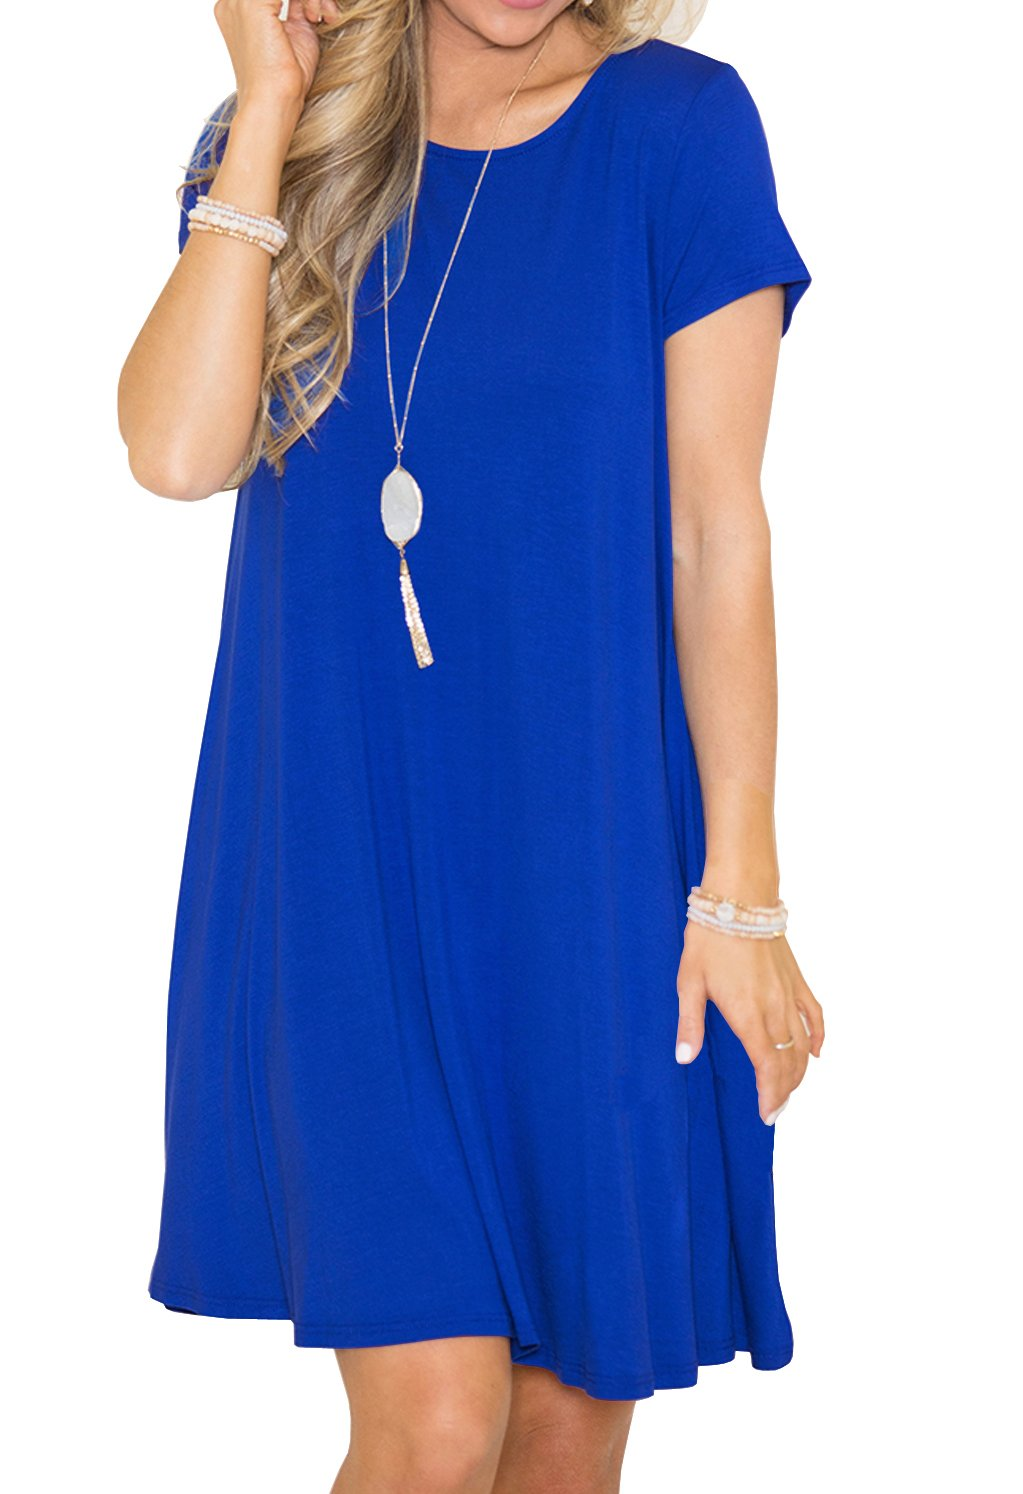 GRECERELLE Women's Short Sleeve Summer Casual Swing T-Shirt Dresses Royal Blue-M